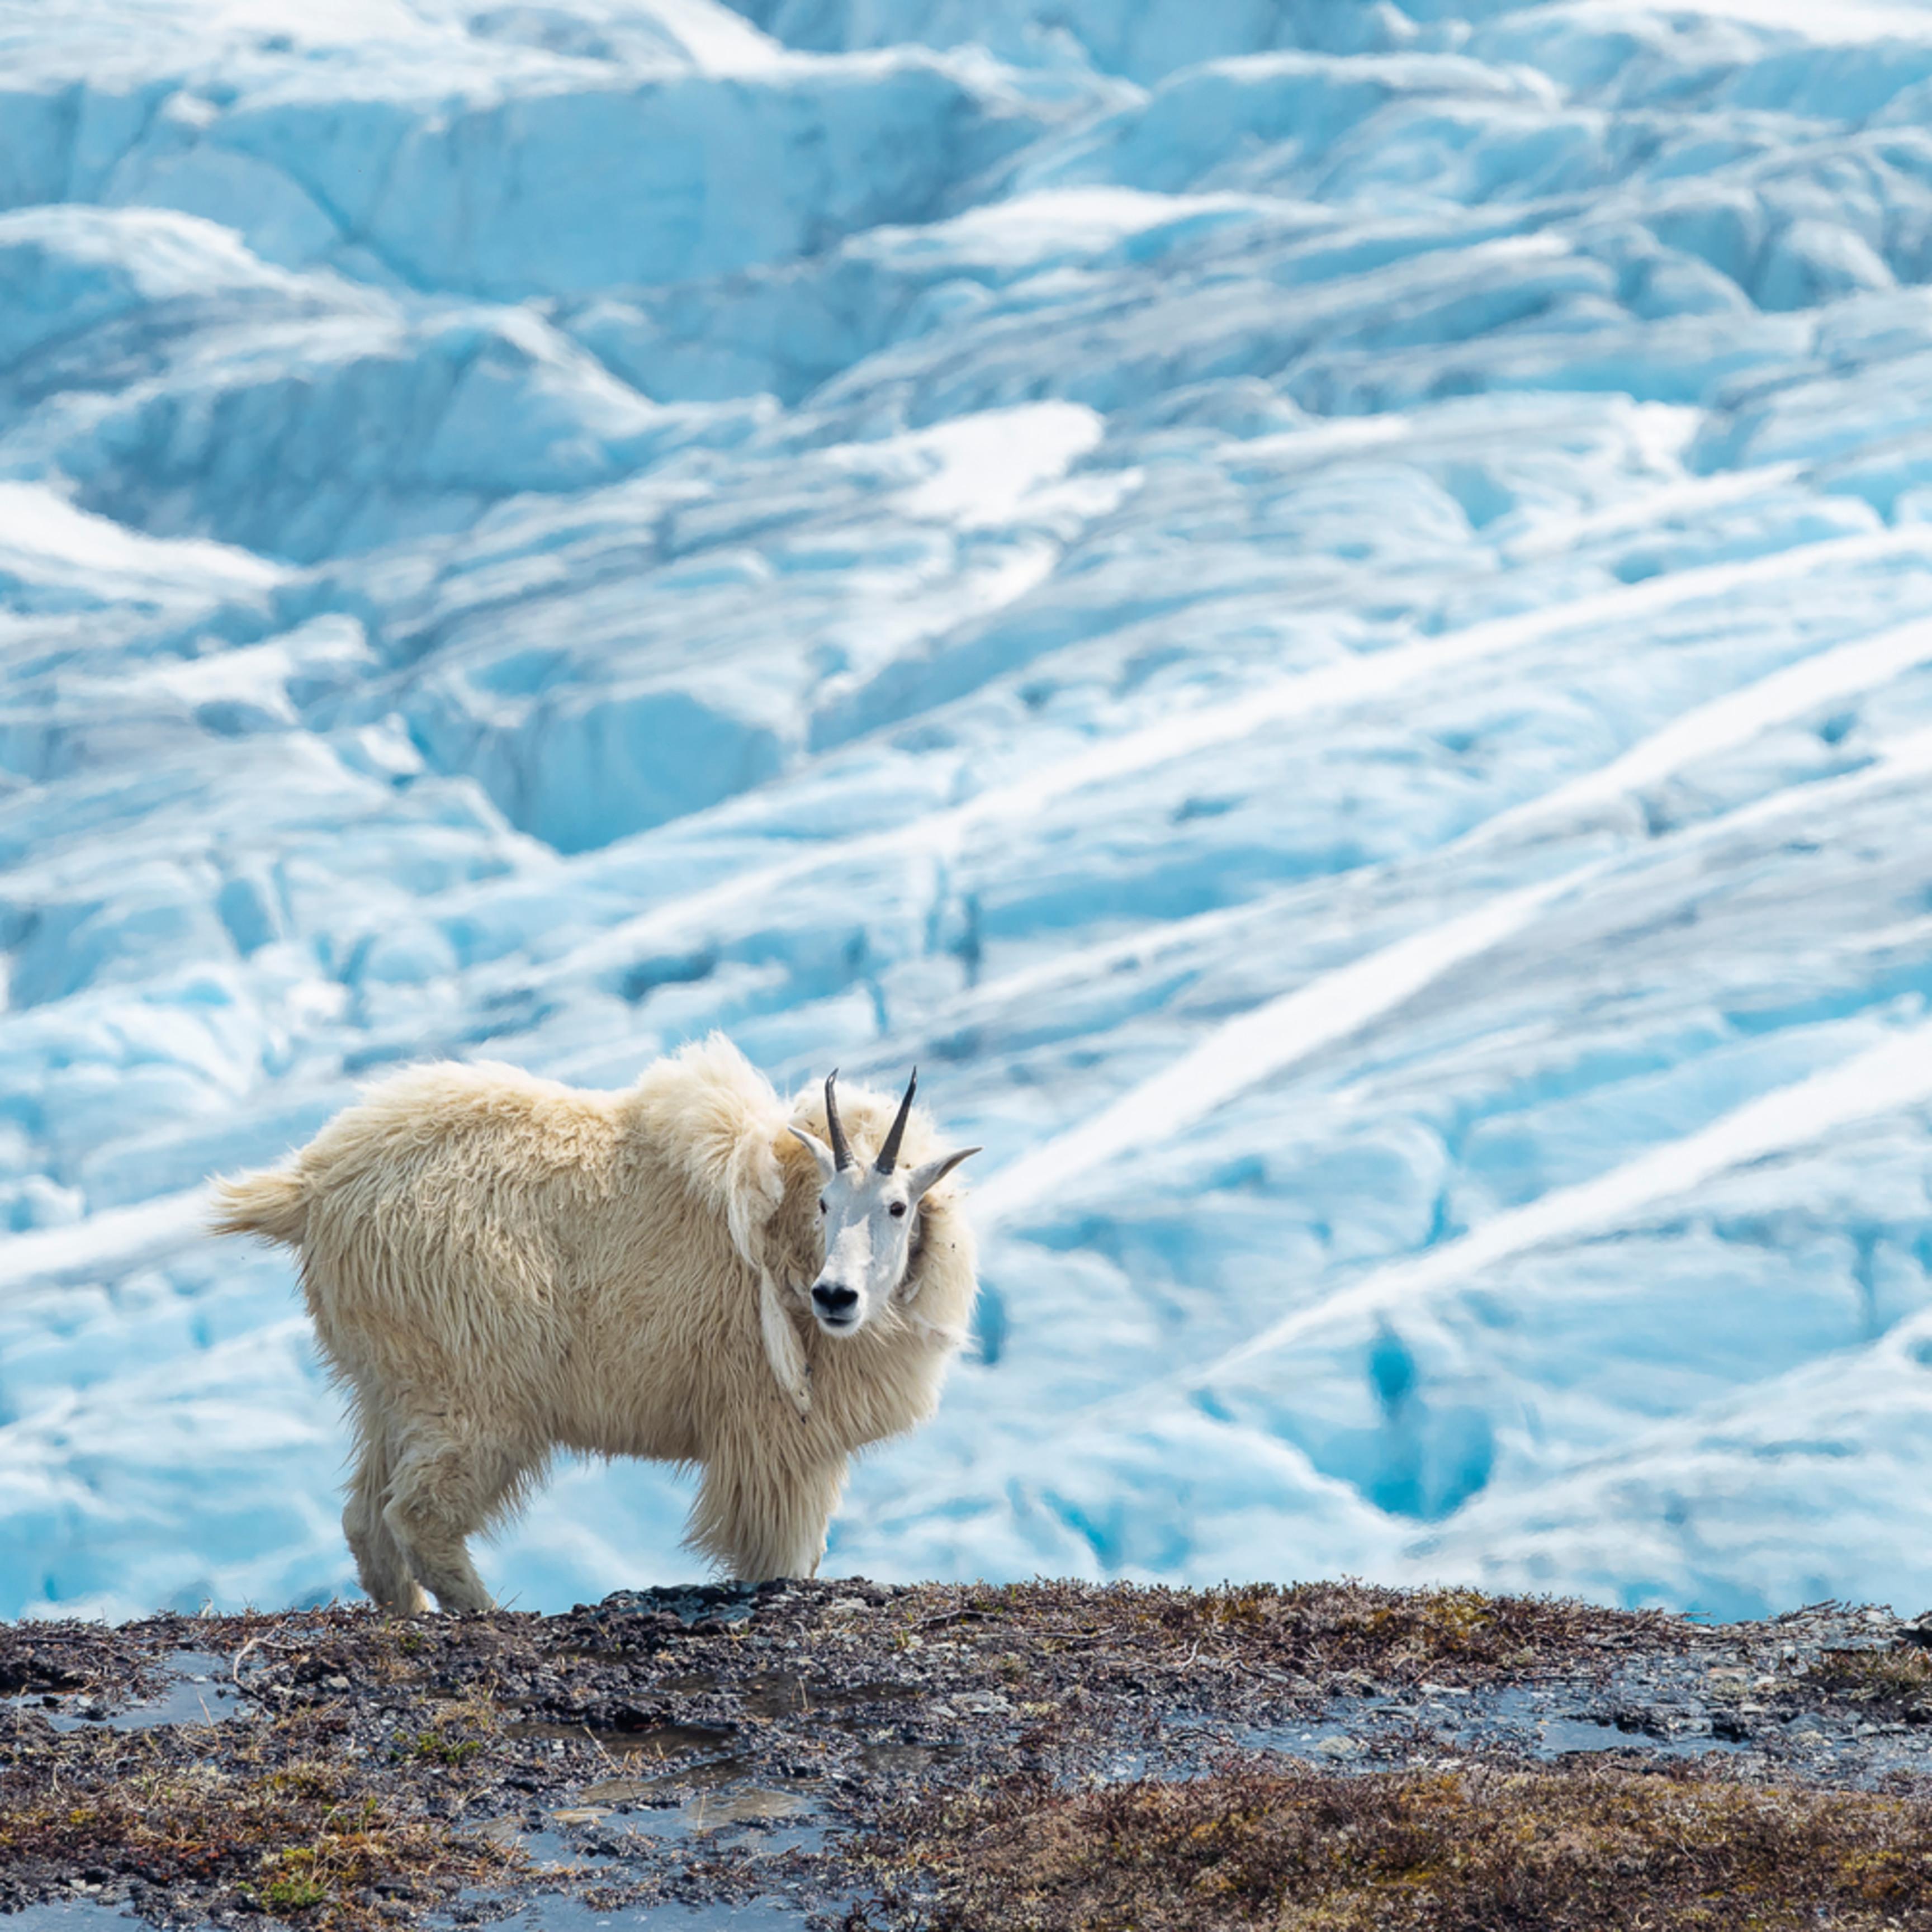 20190623 mountain goat em14833 artstorefronts vfgyys